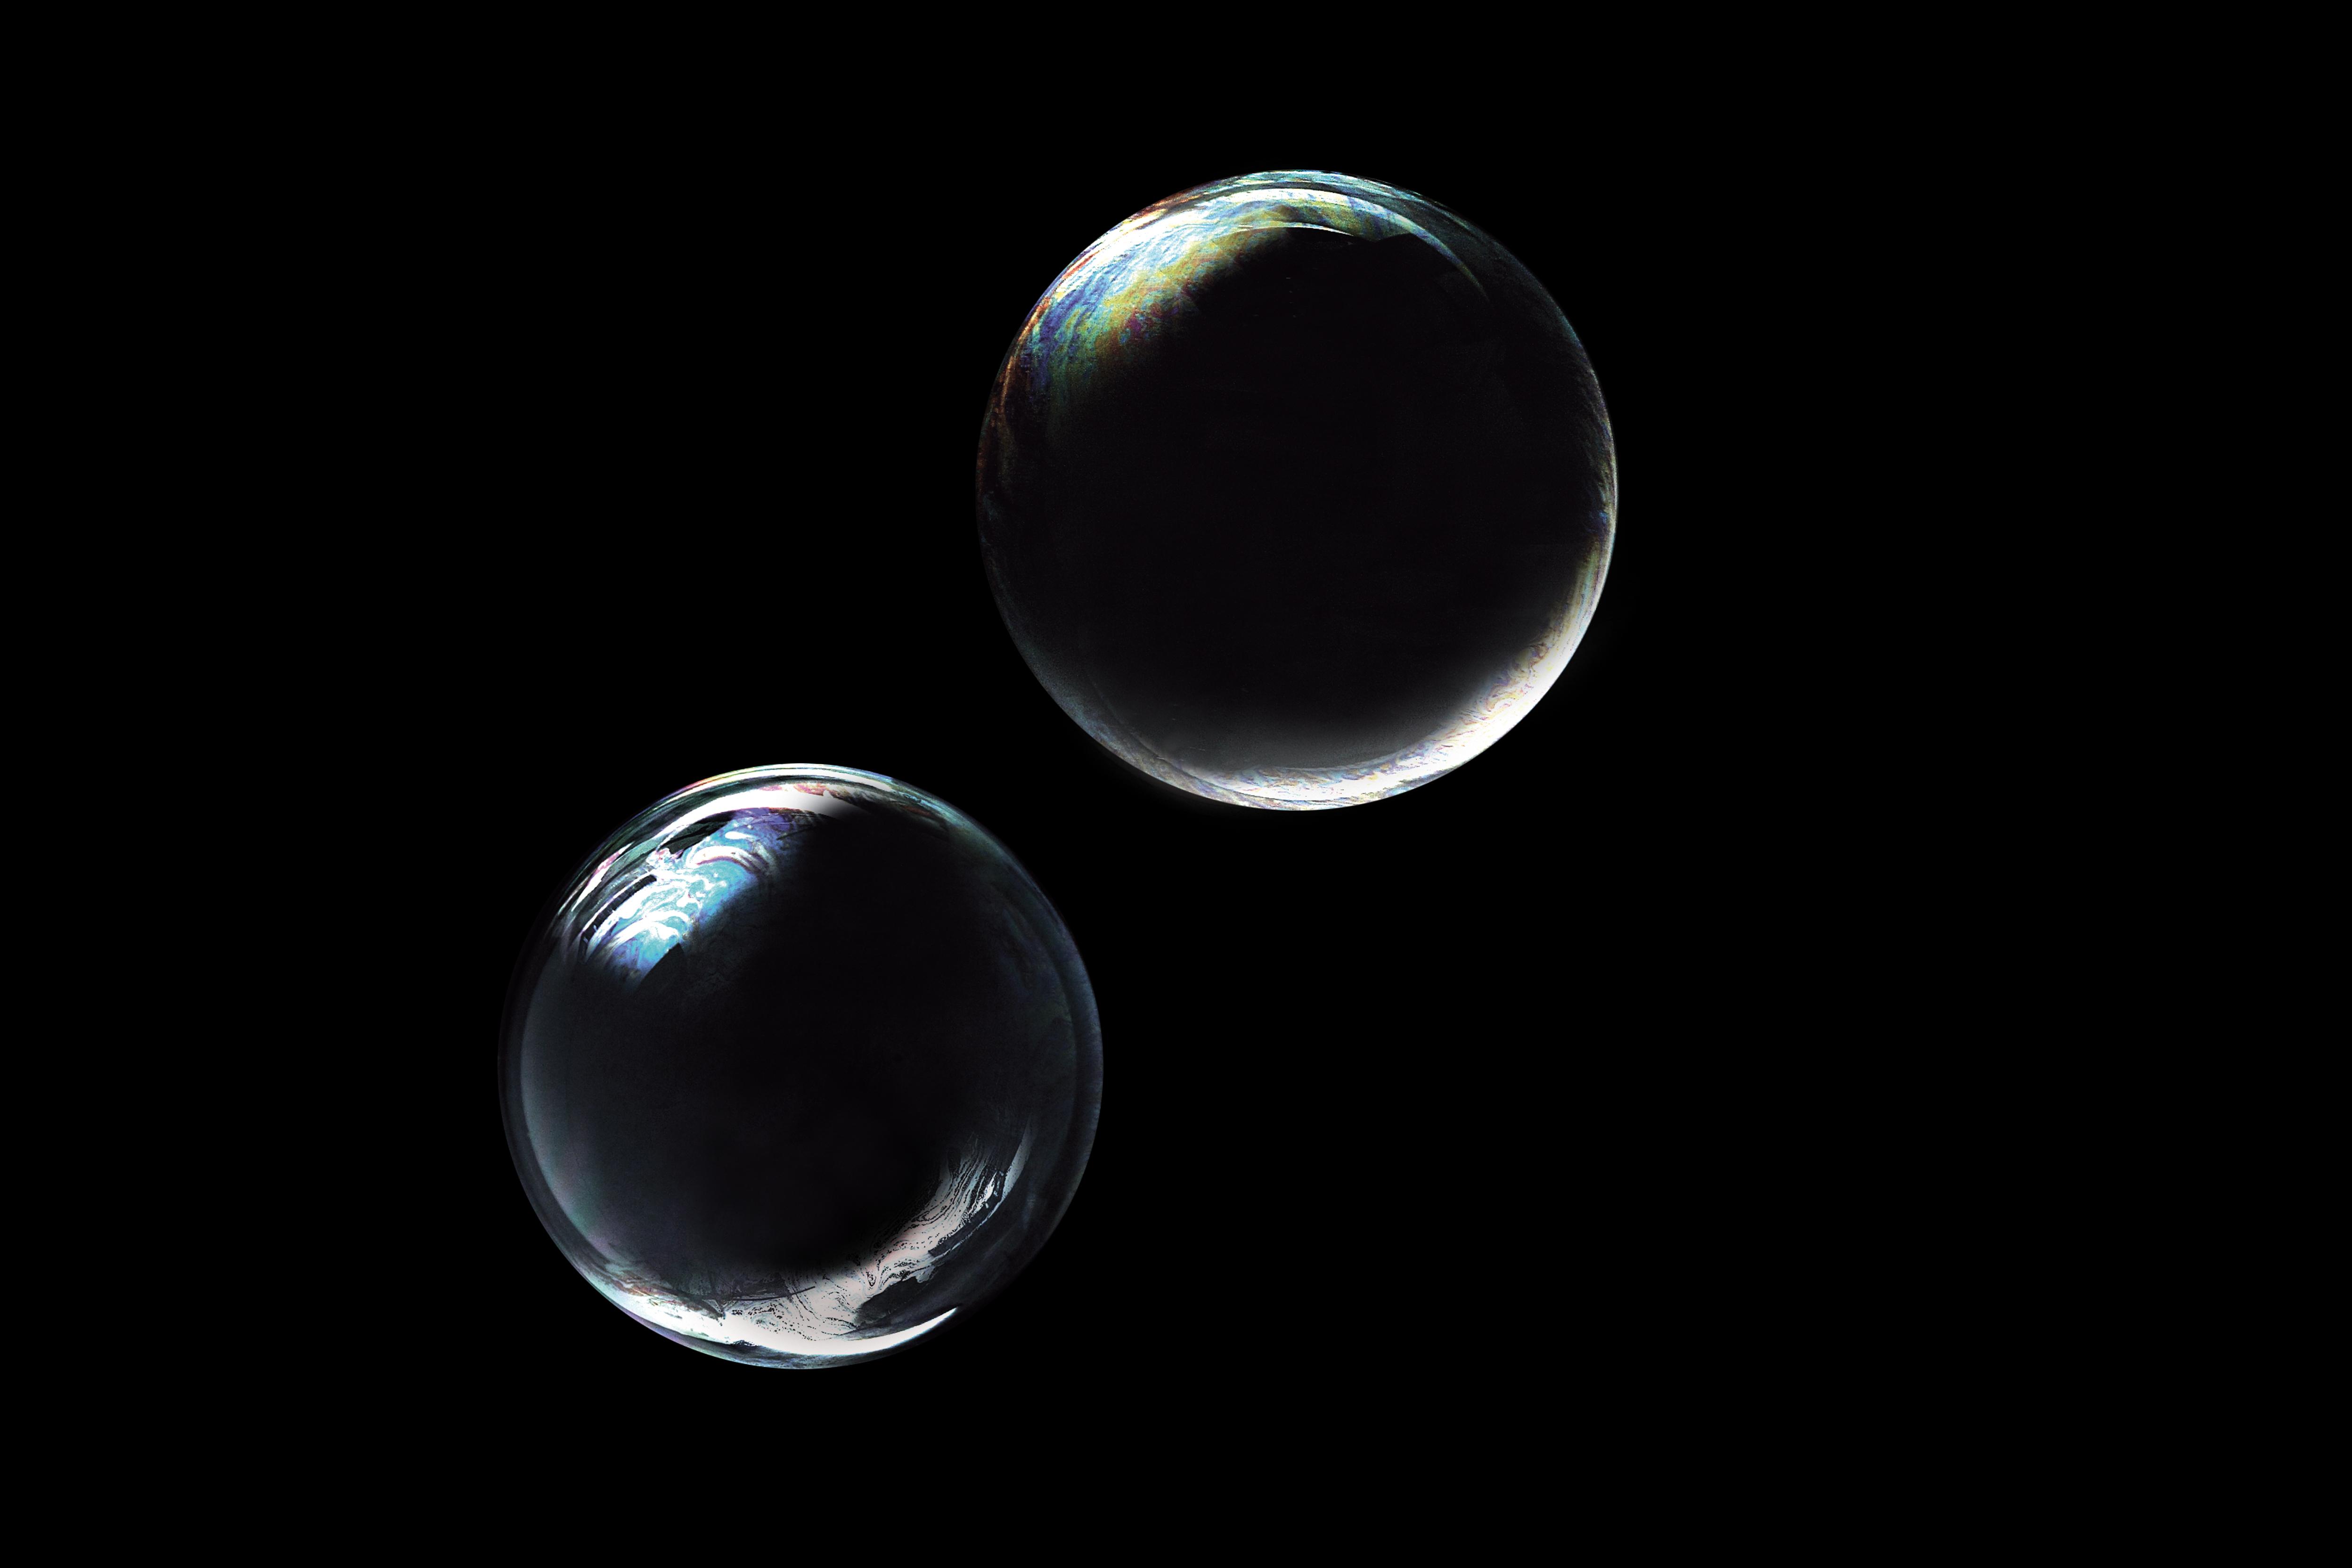 Bubble HD wallpapers, Desktop wallpaper - most viewed